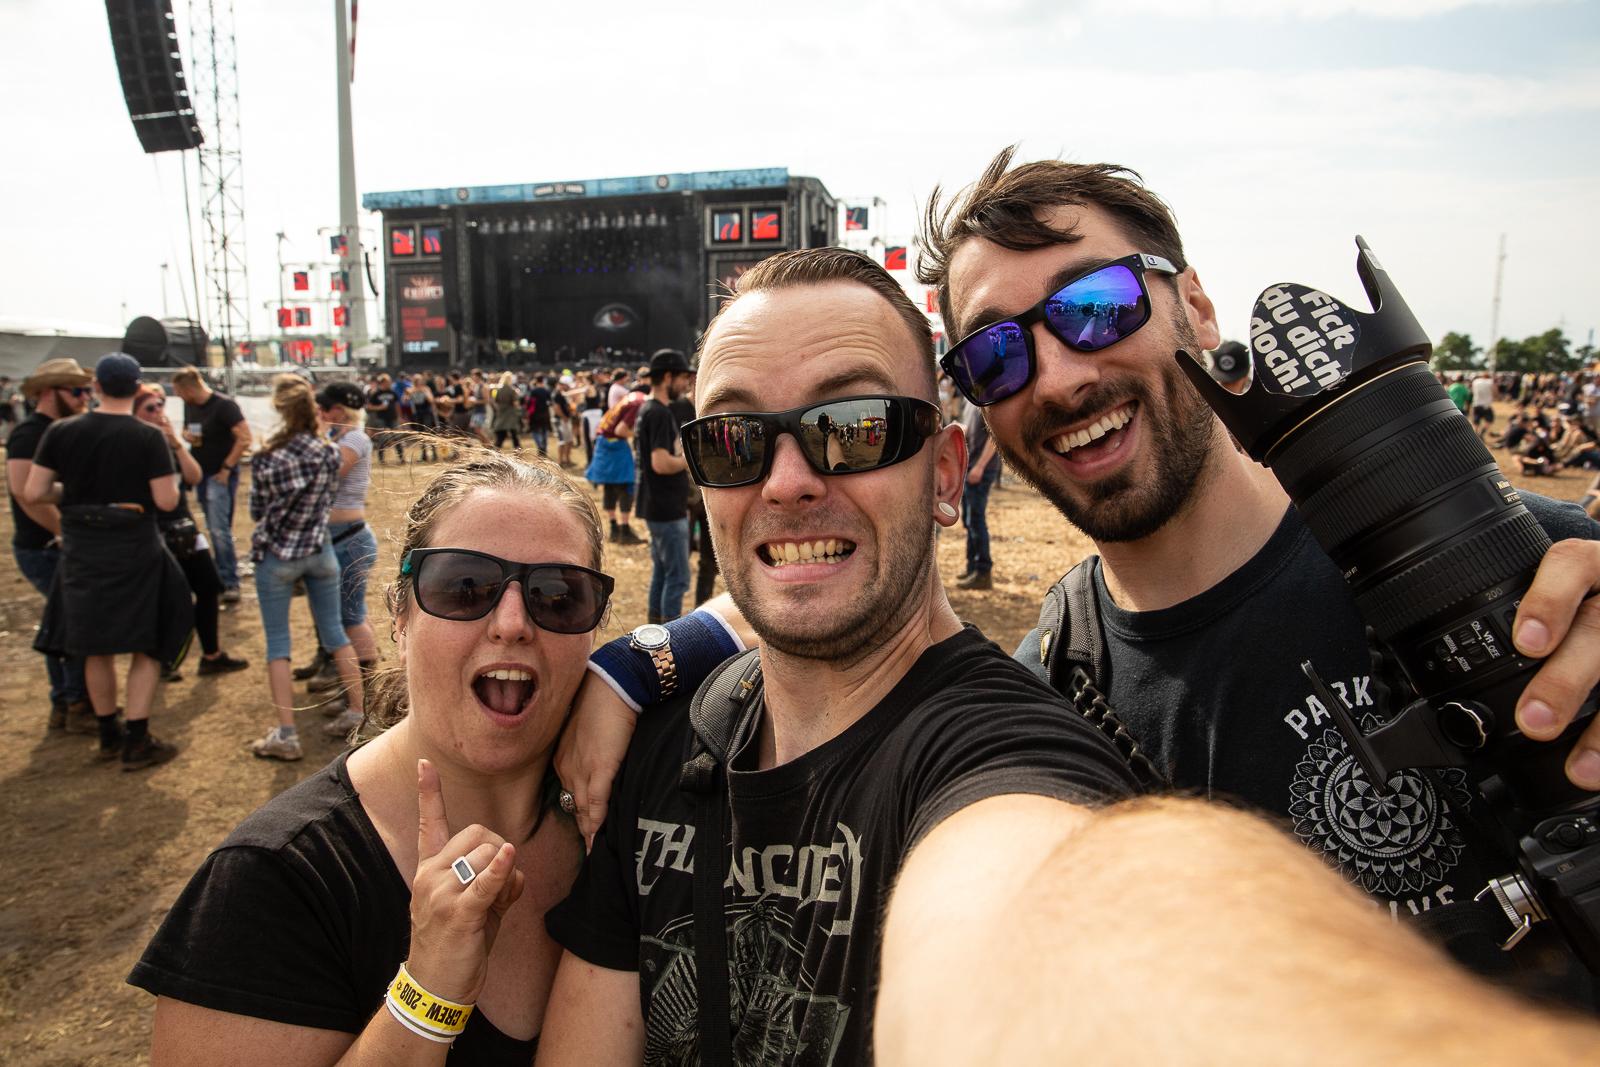 BEST OF NOVA ROCK FESTIVAL 2018